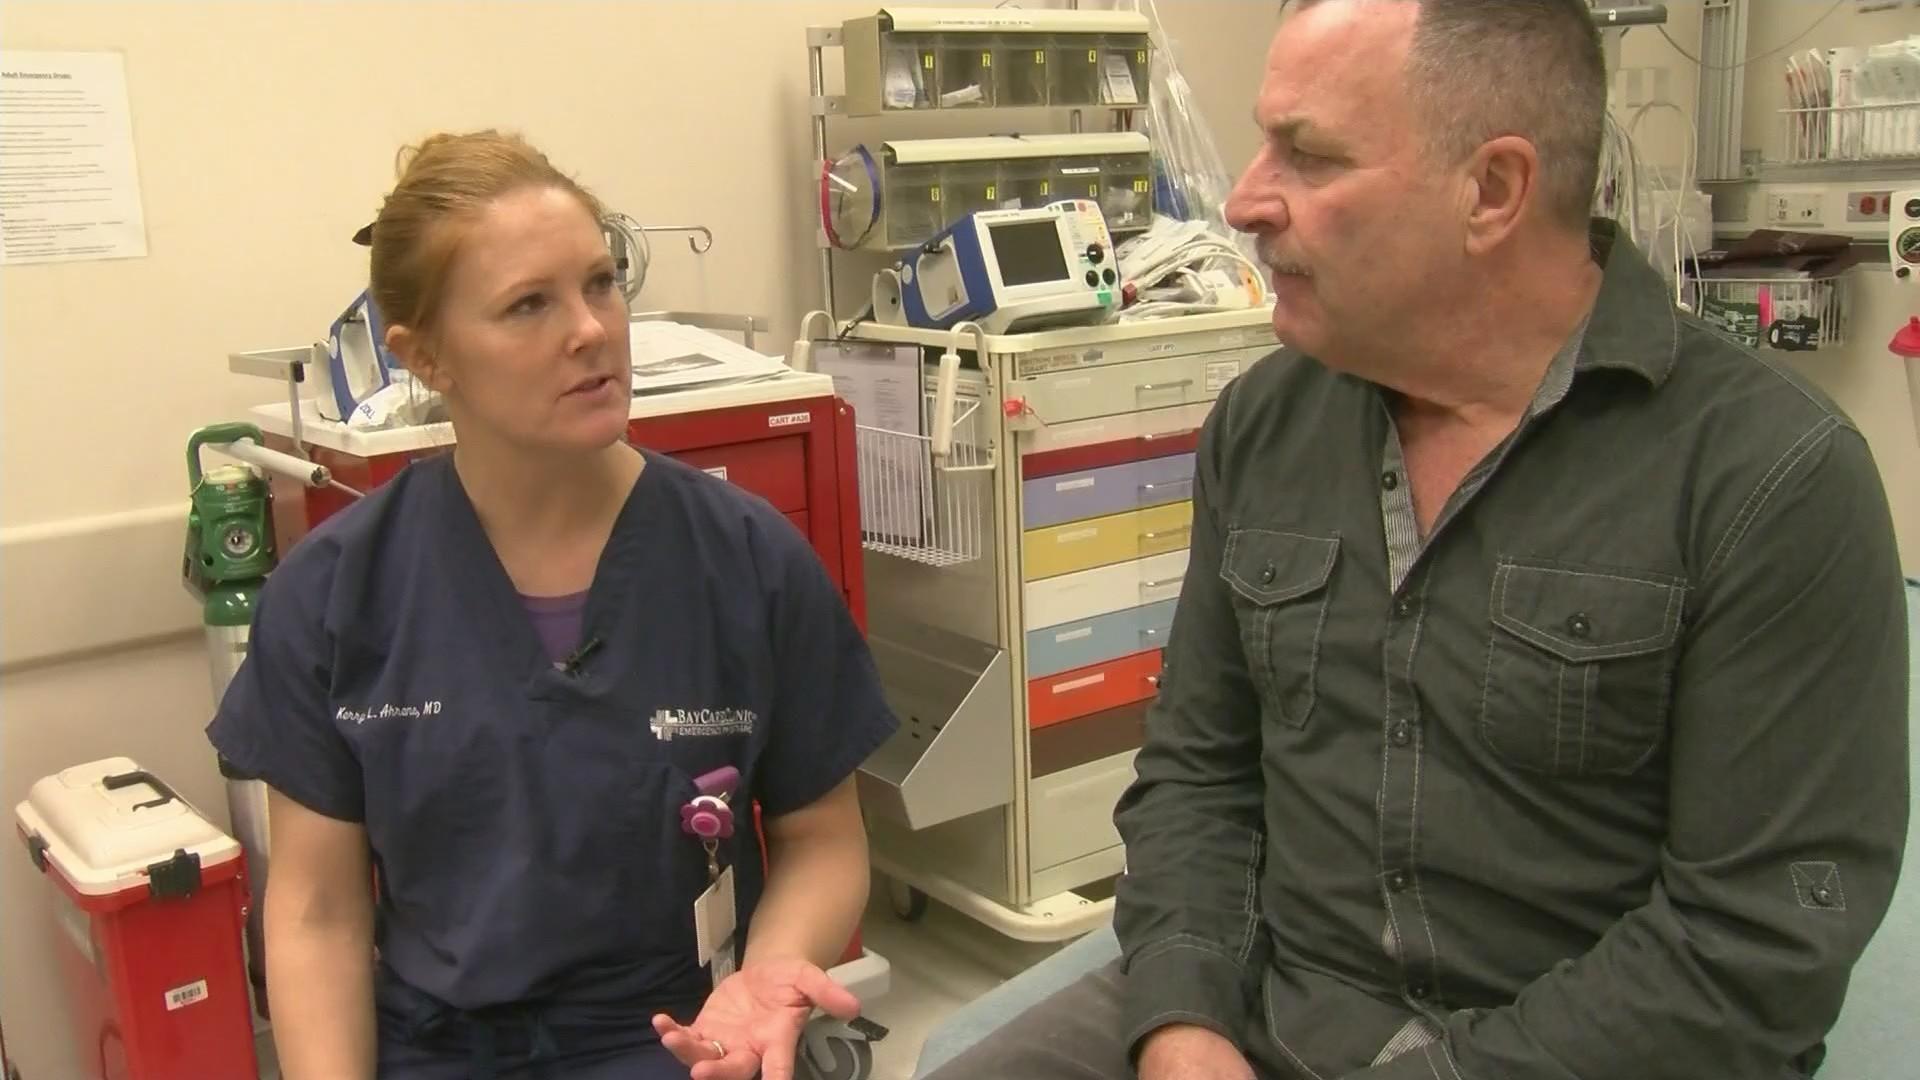 Healthwatch-Heart Attack vs. Cardiac Arrest